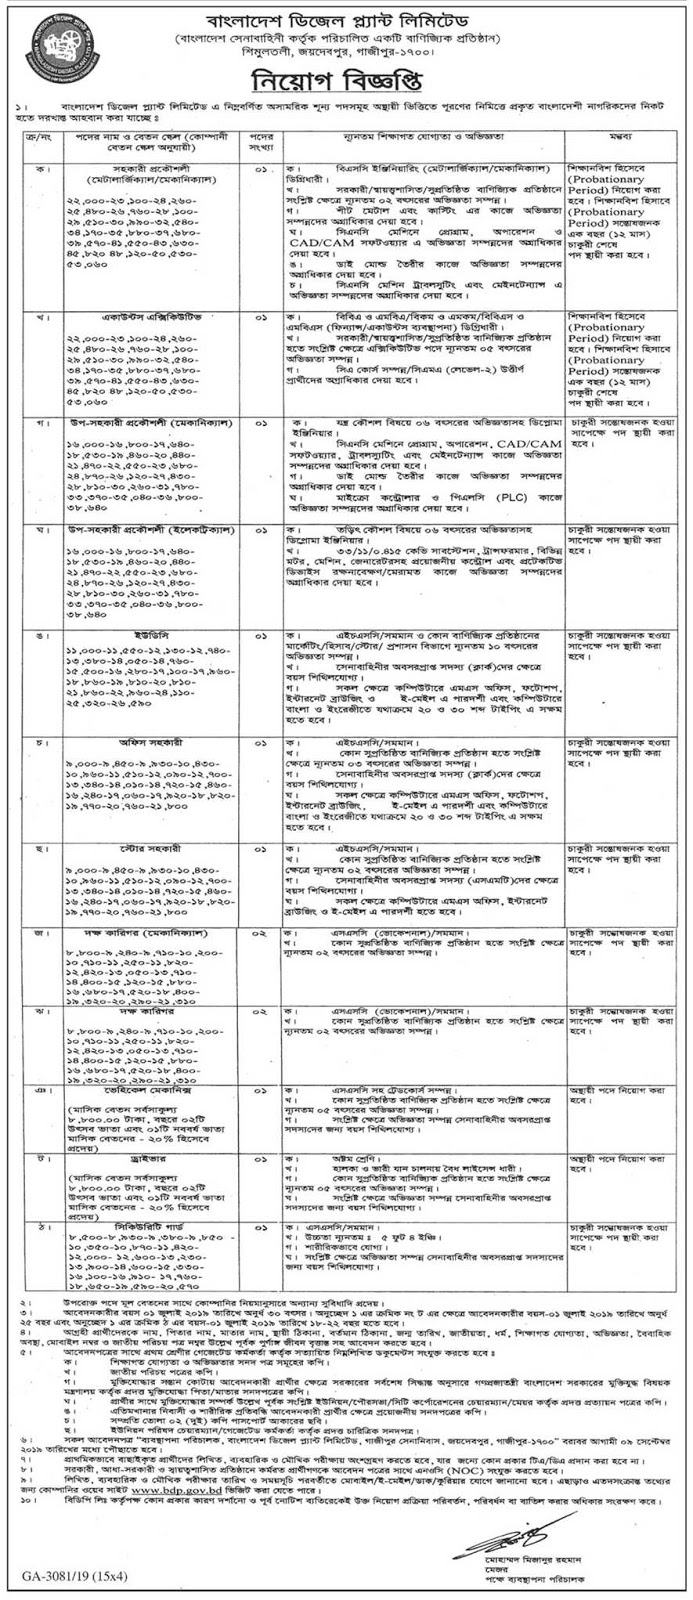 Bangladesh Diesel Plant Ltd Job Circular 2019